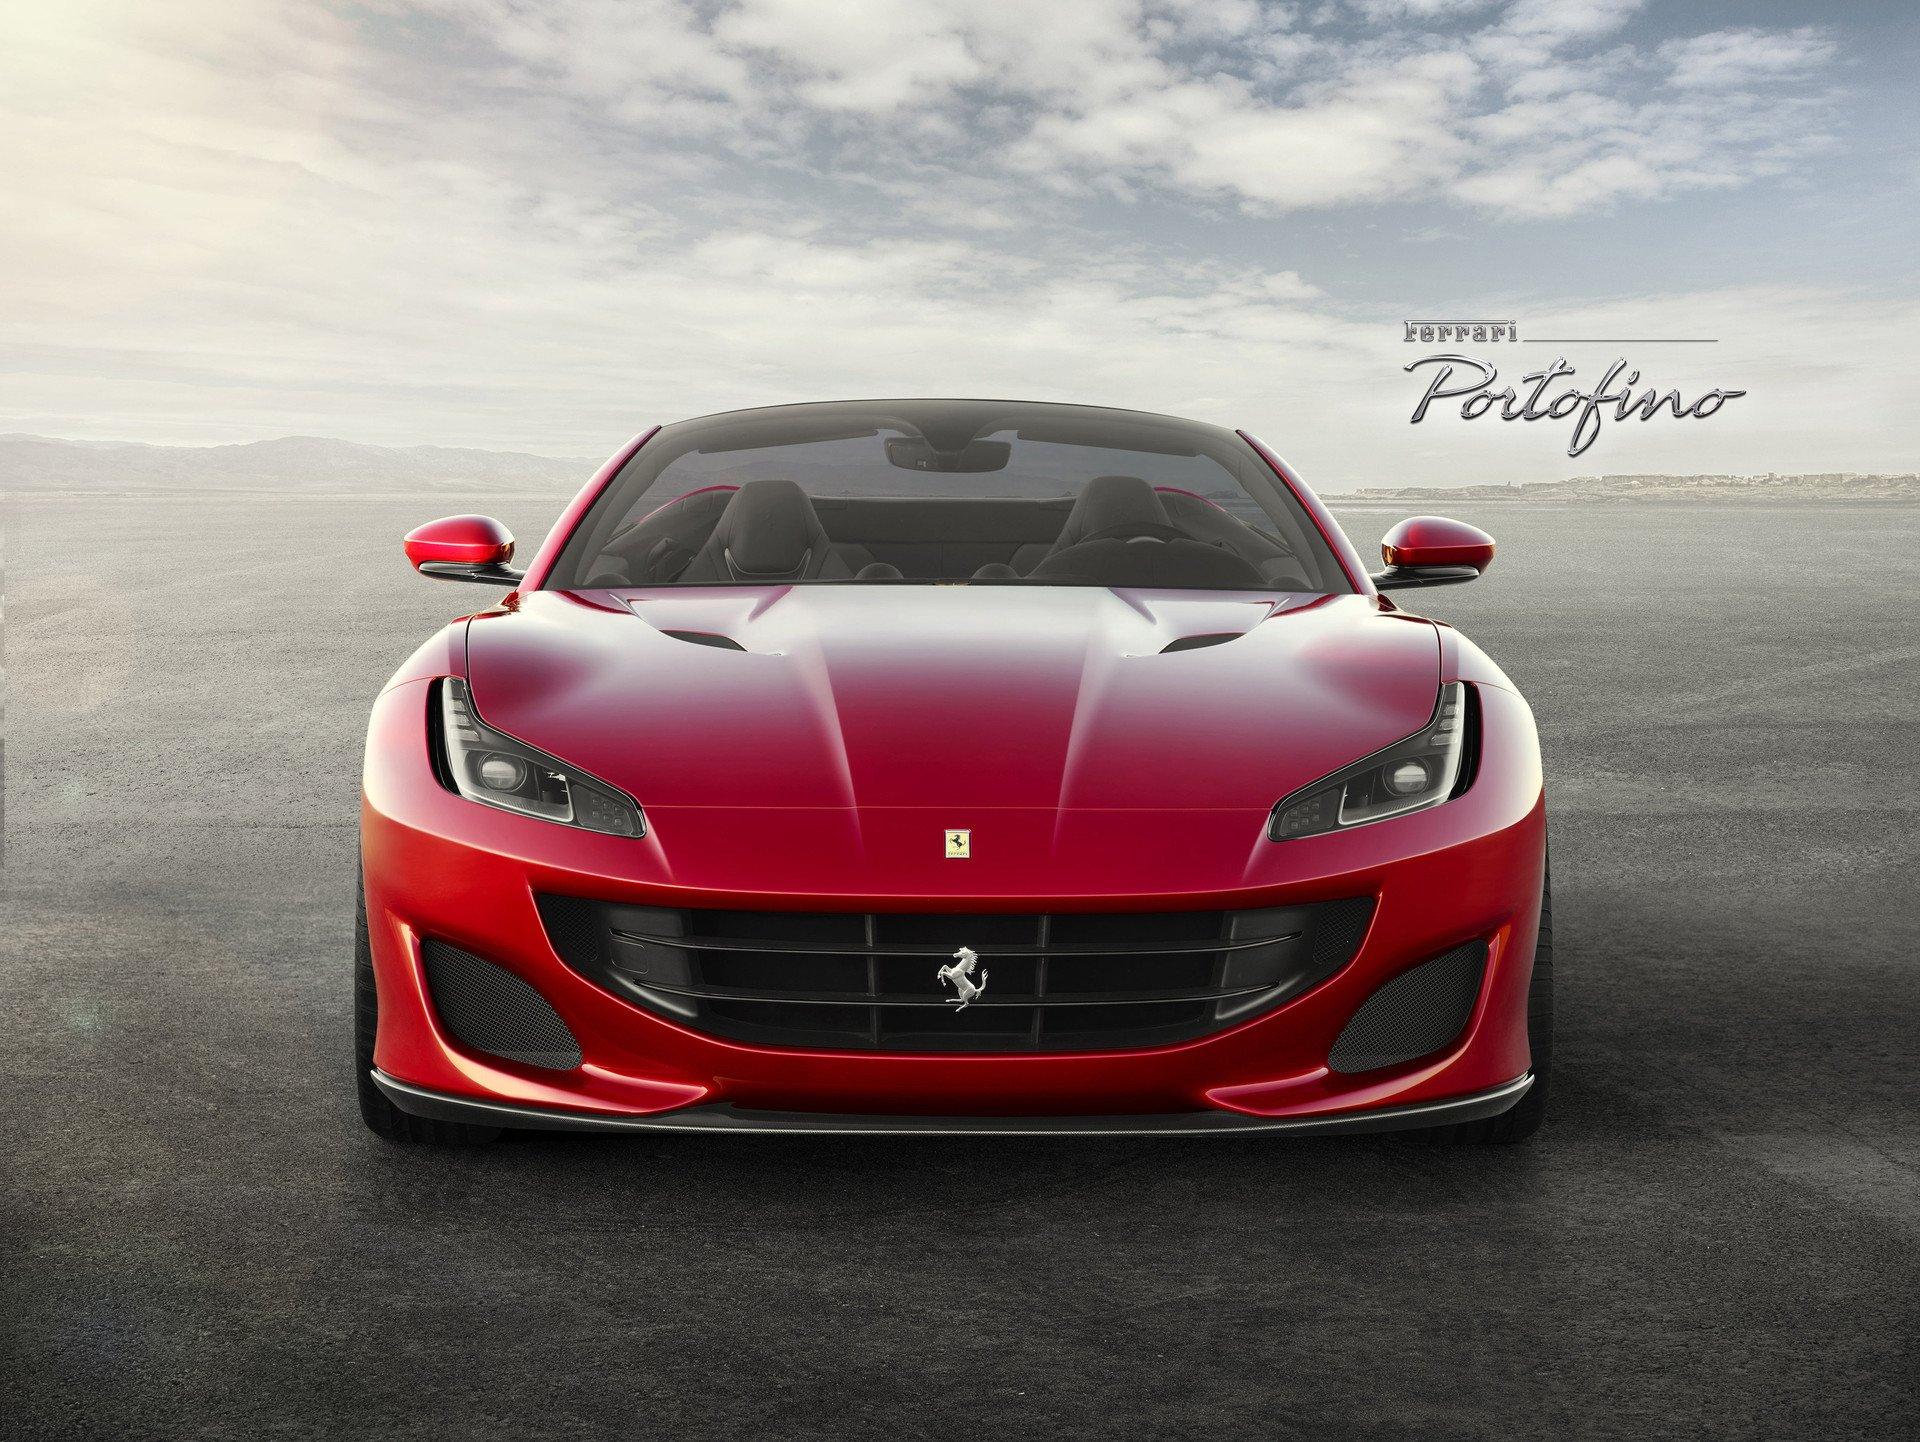 Ferrari Portofino Exterieur